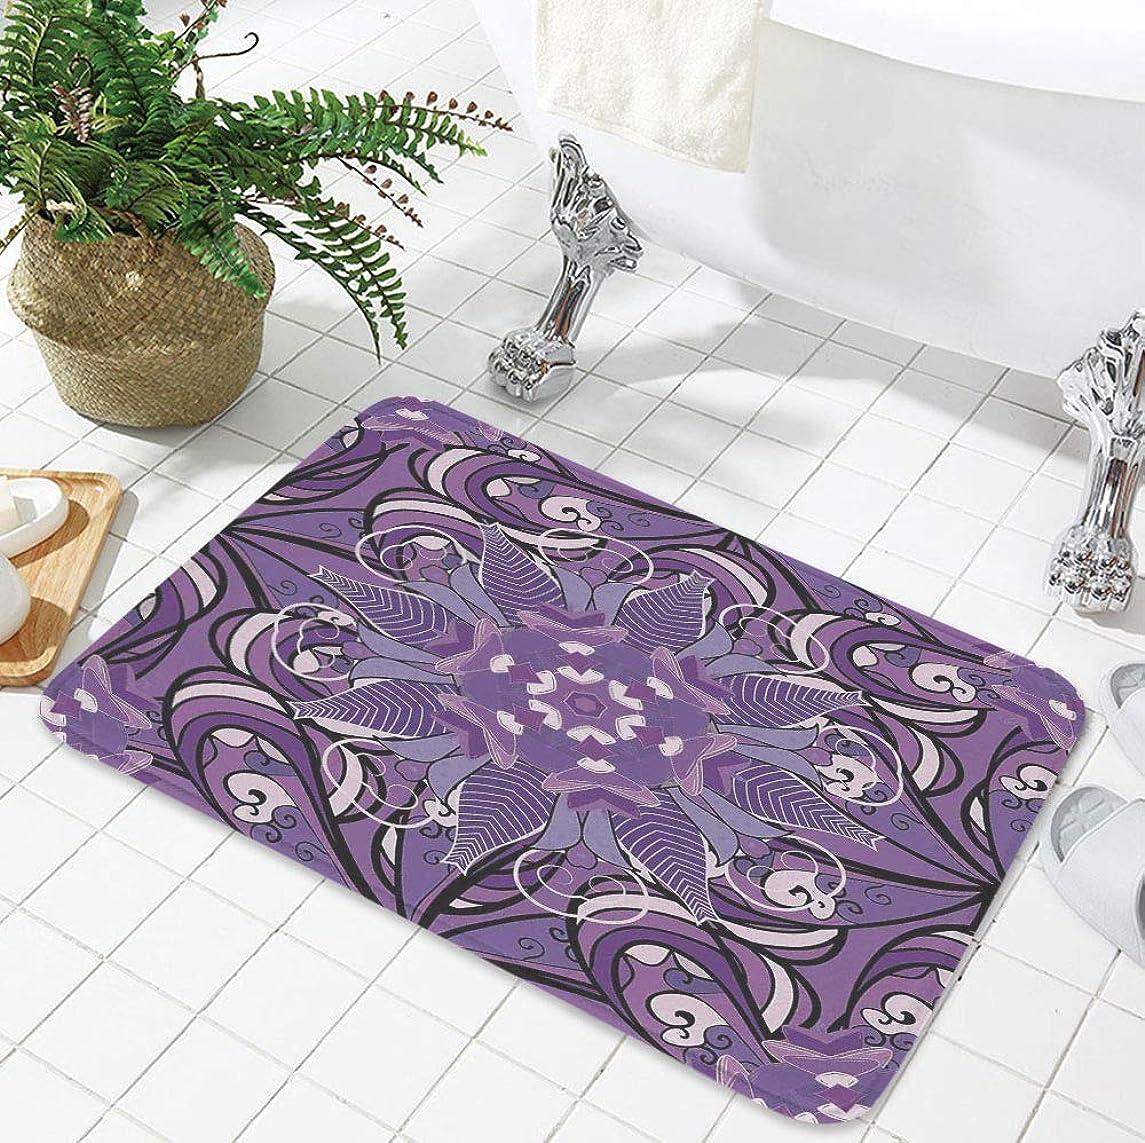 YOLIYANA Modern Carpet,Mauve,for Living Room Bathroom,19.69